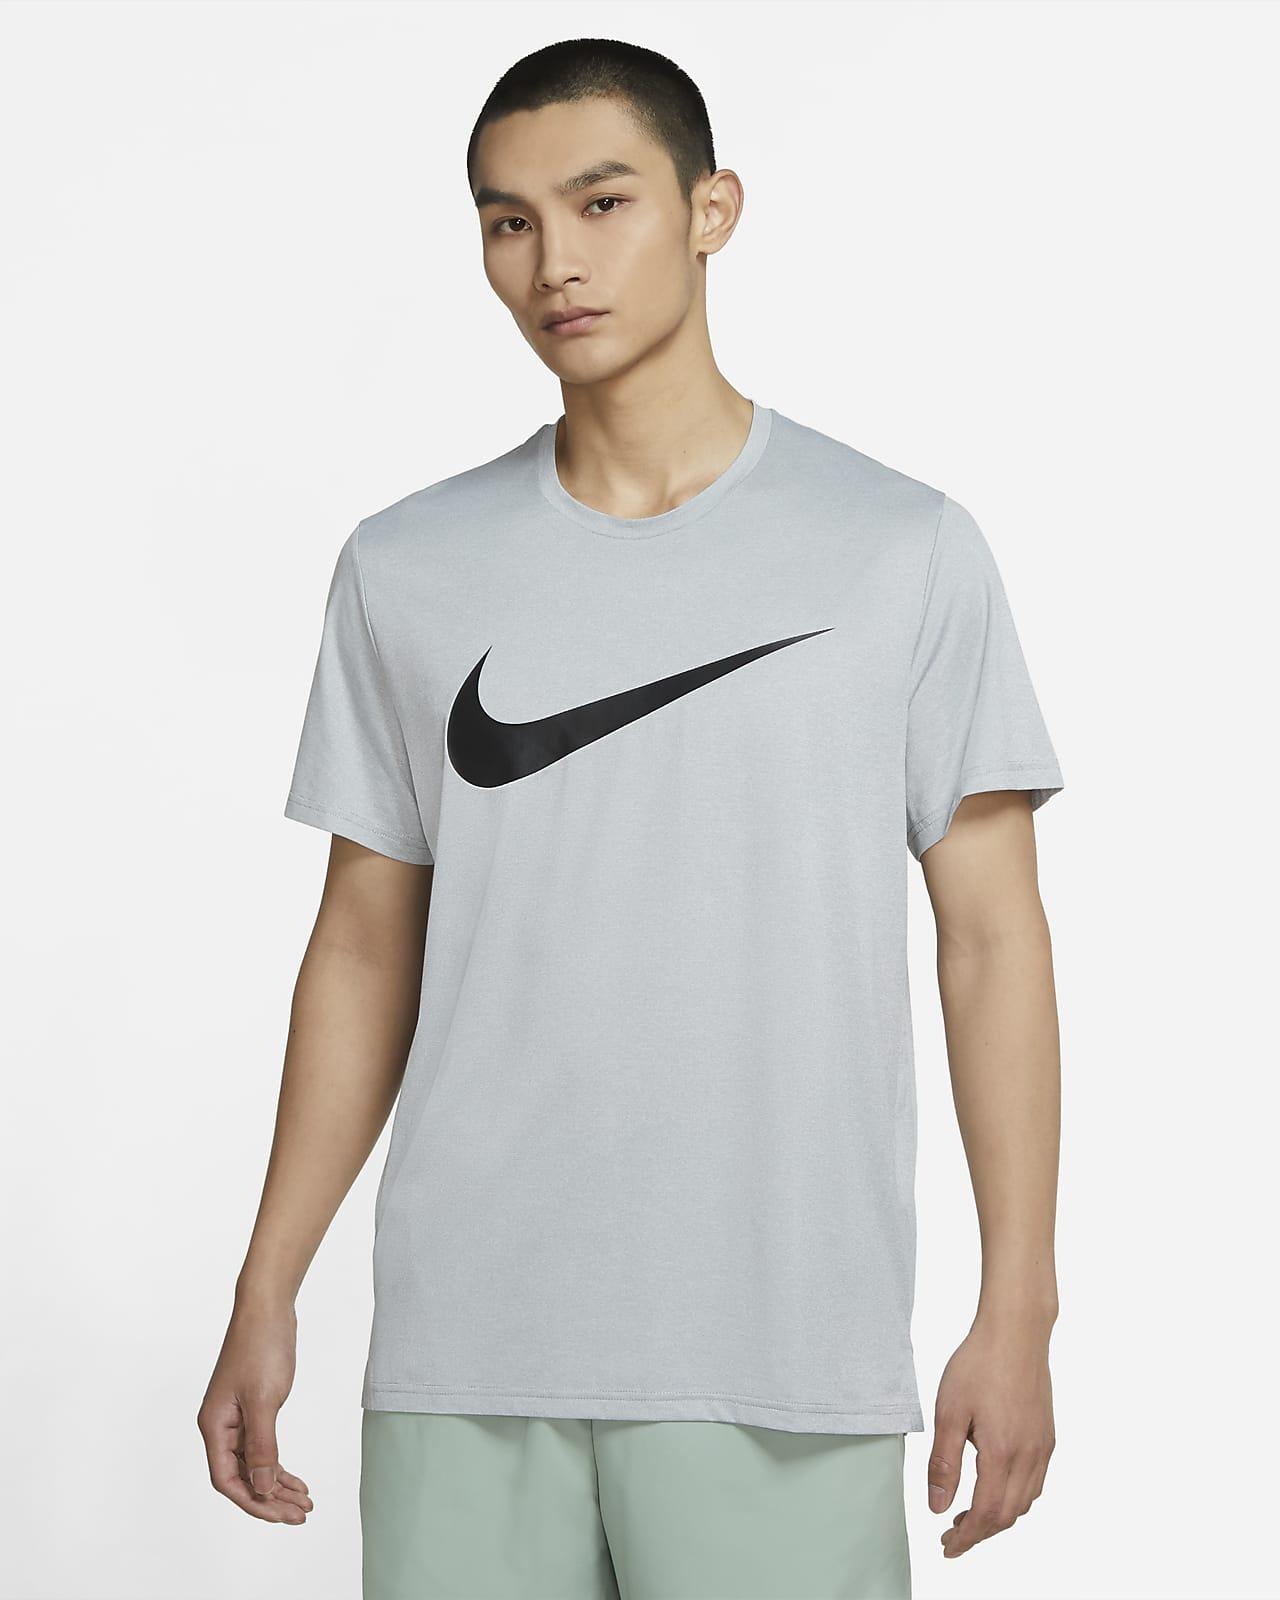 Nike Pro Dri-FIT 男子短袖印花训练上衣